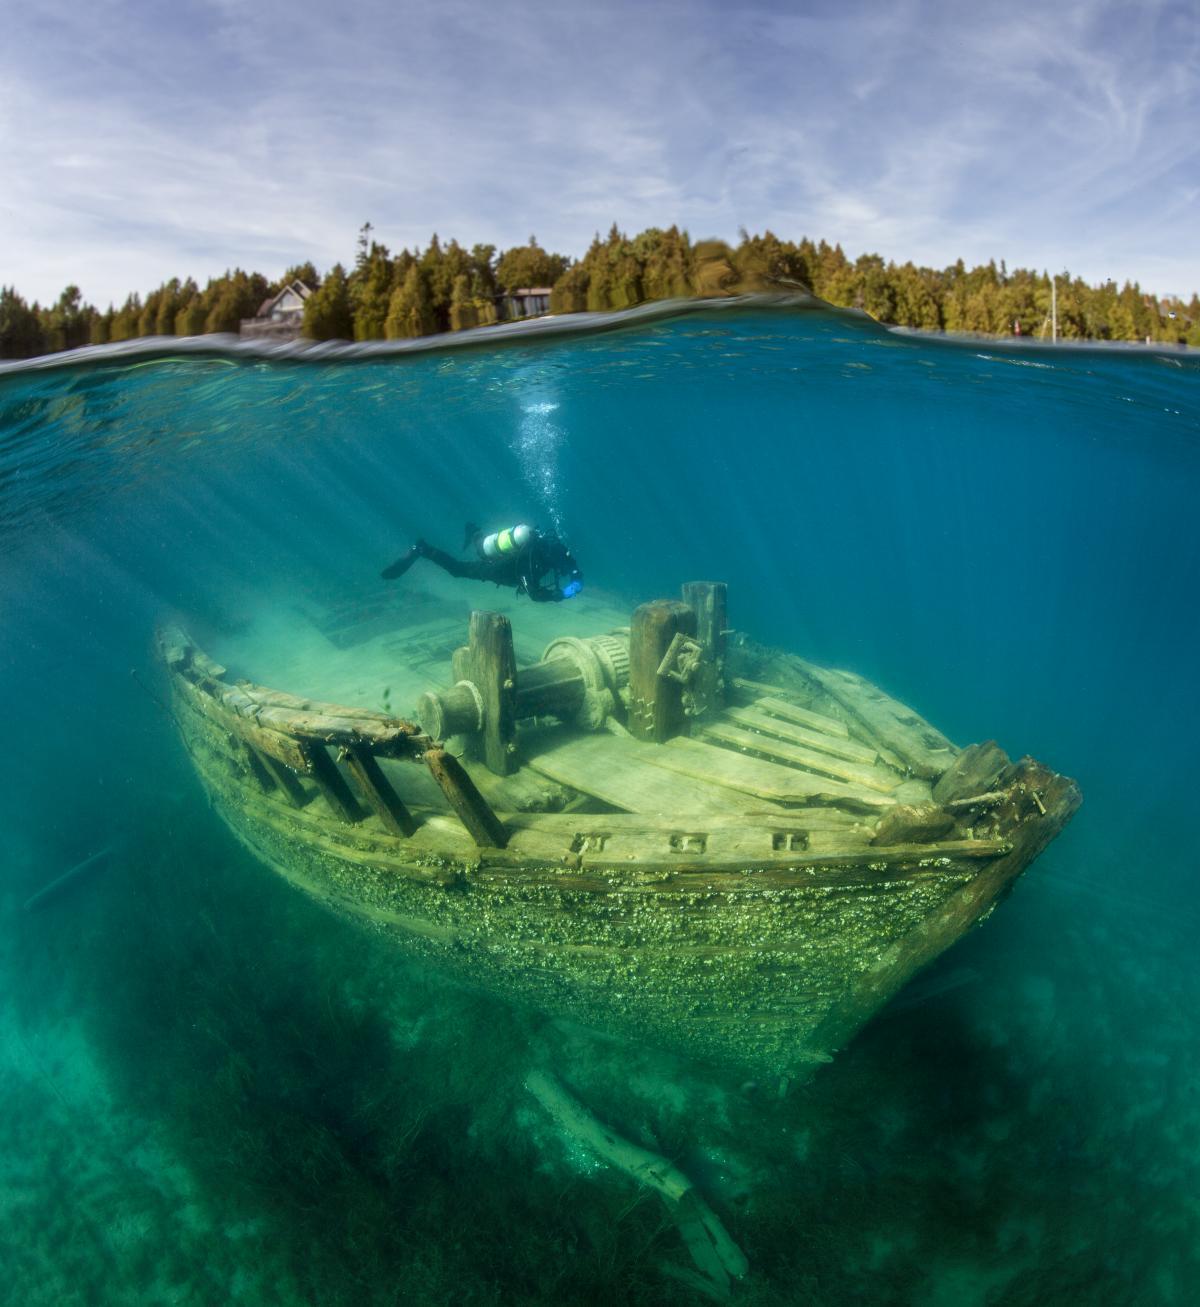 A scuba diver at a shipwreck in Fathom Five National Marine Sanctuary